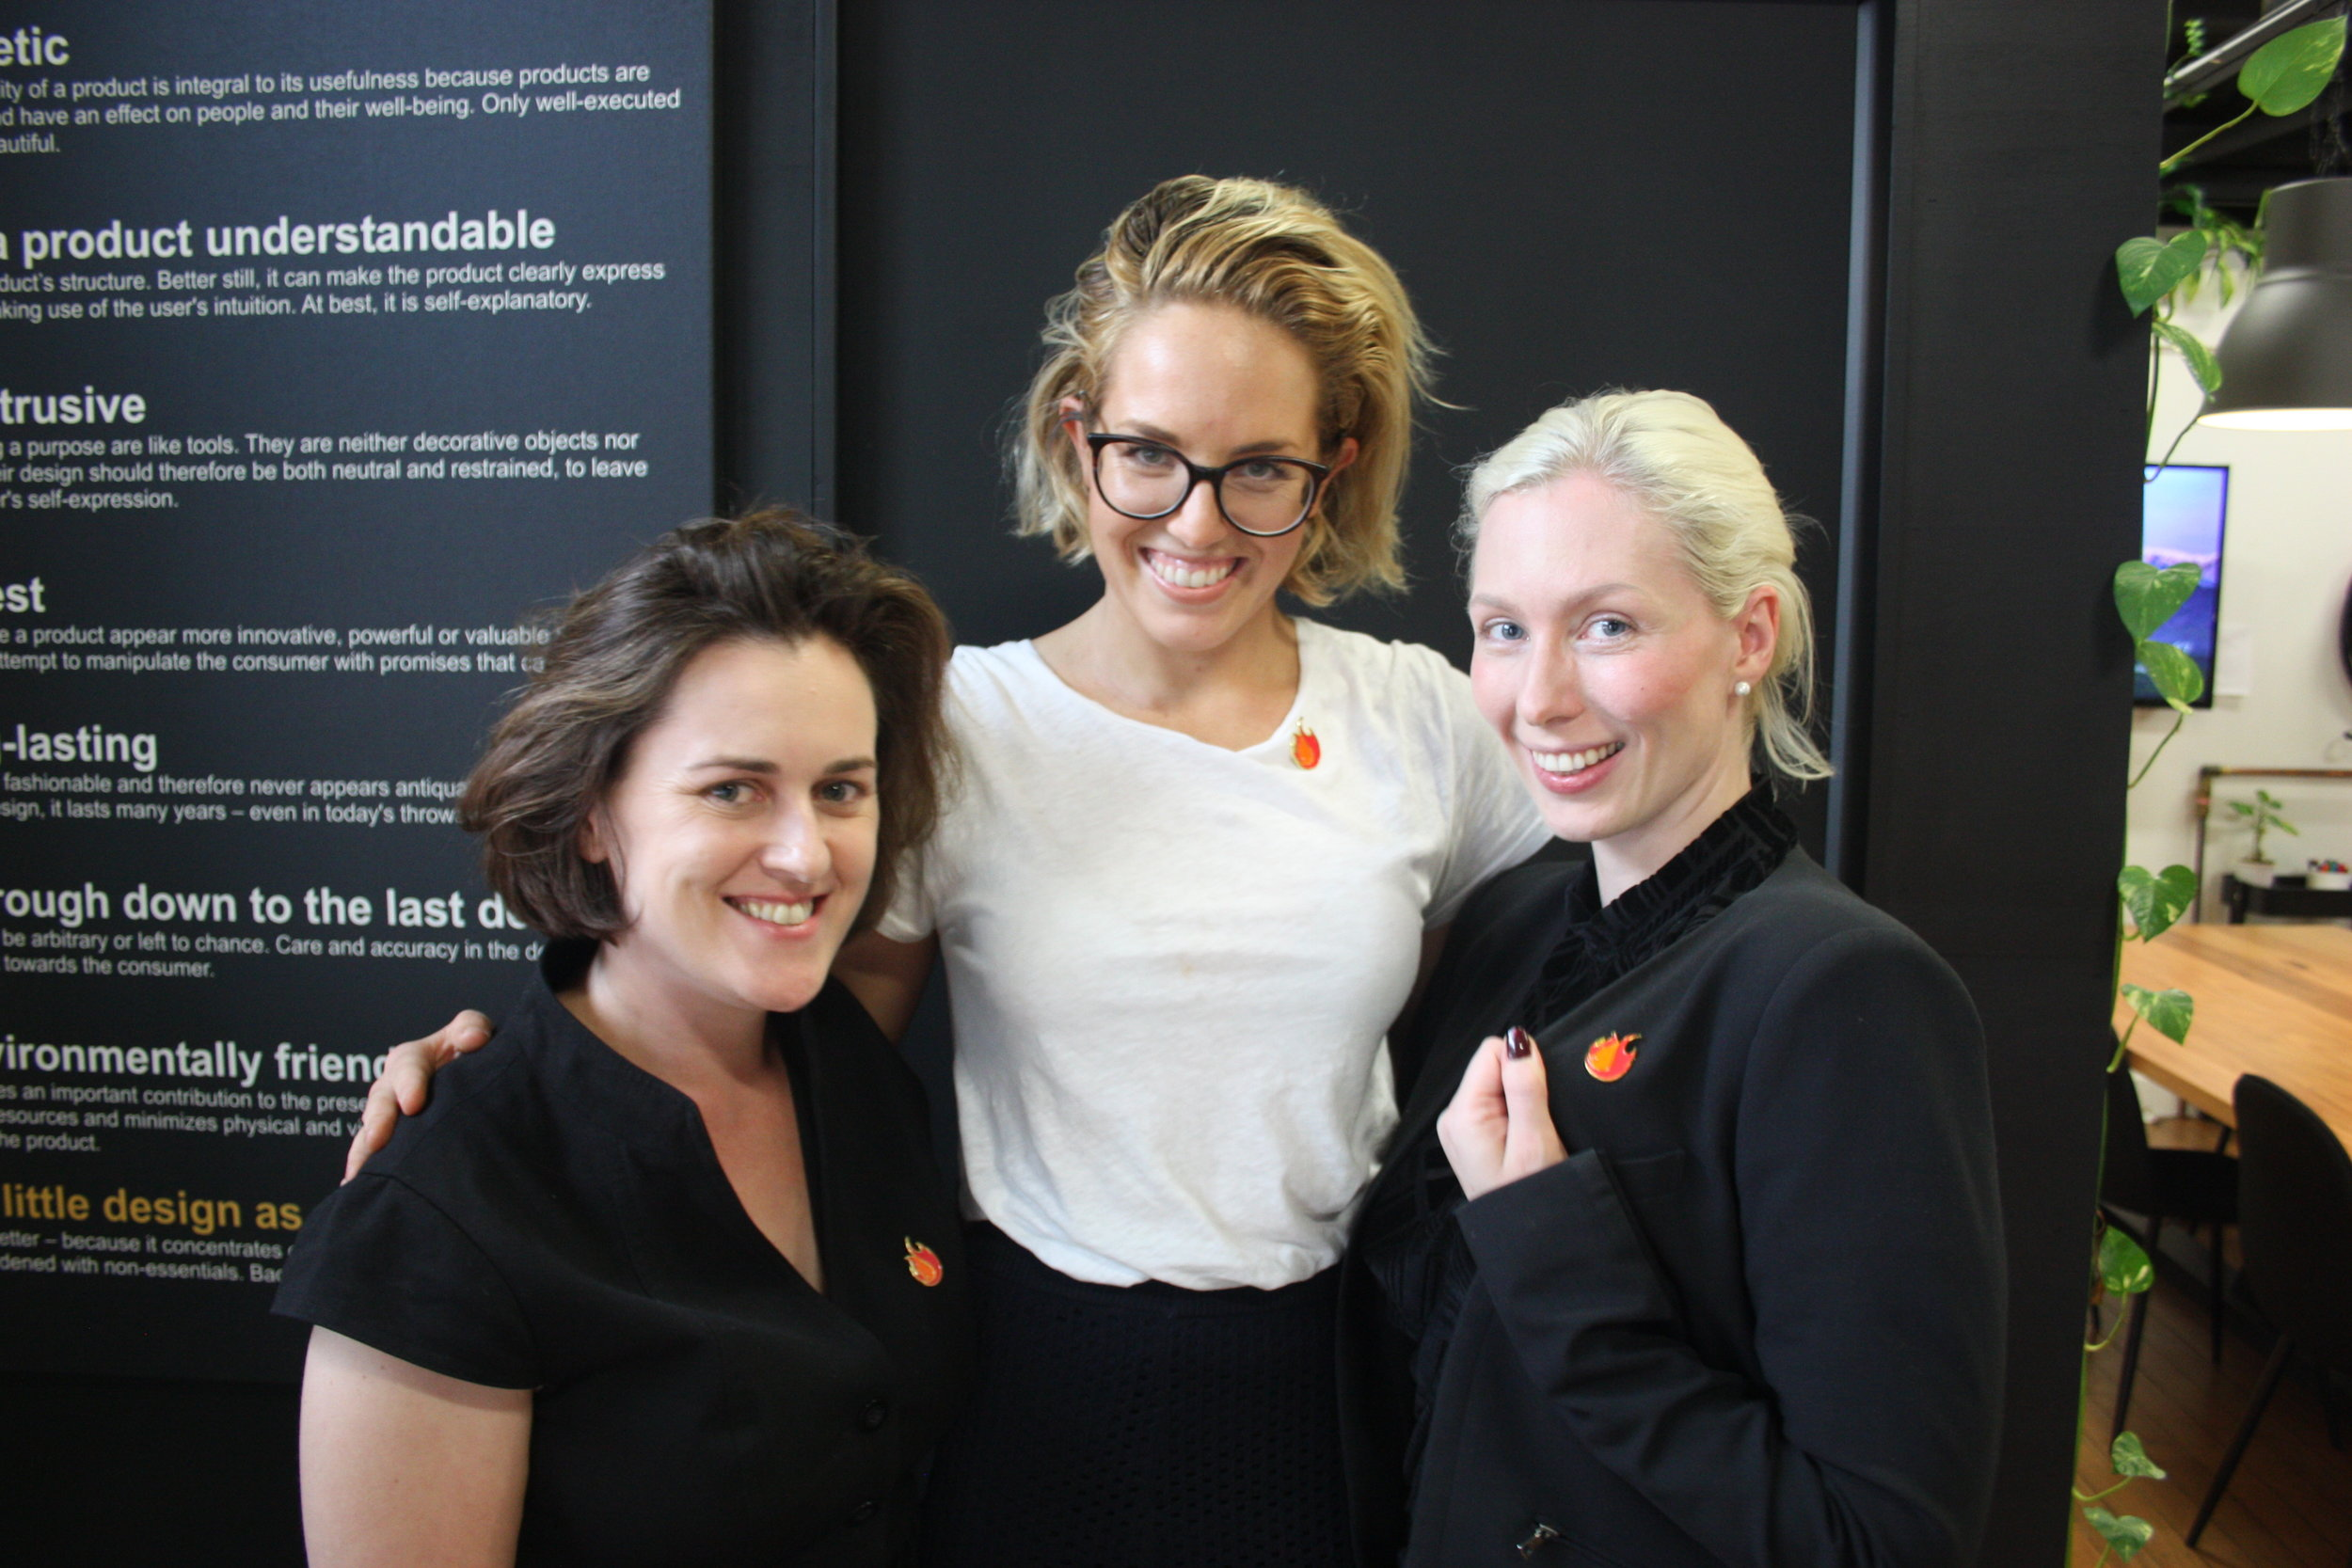 L to R: Felicity Davidson, Alex French and Sara Pontopiddan show off their orange FUEL flame pins